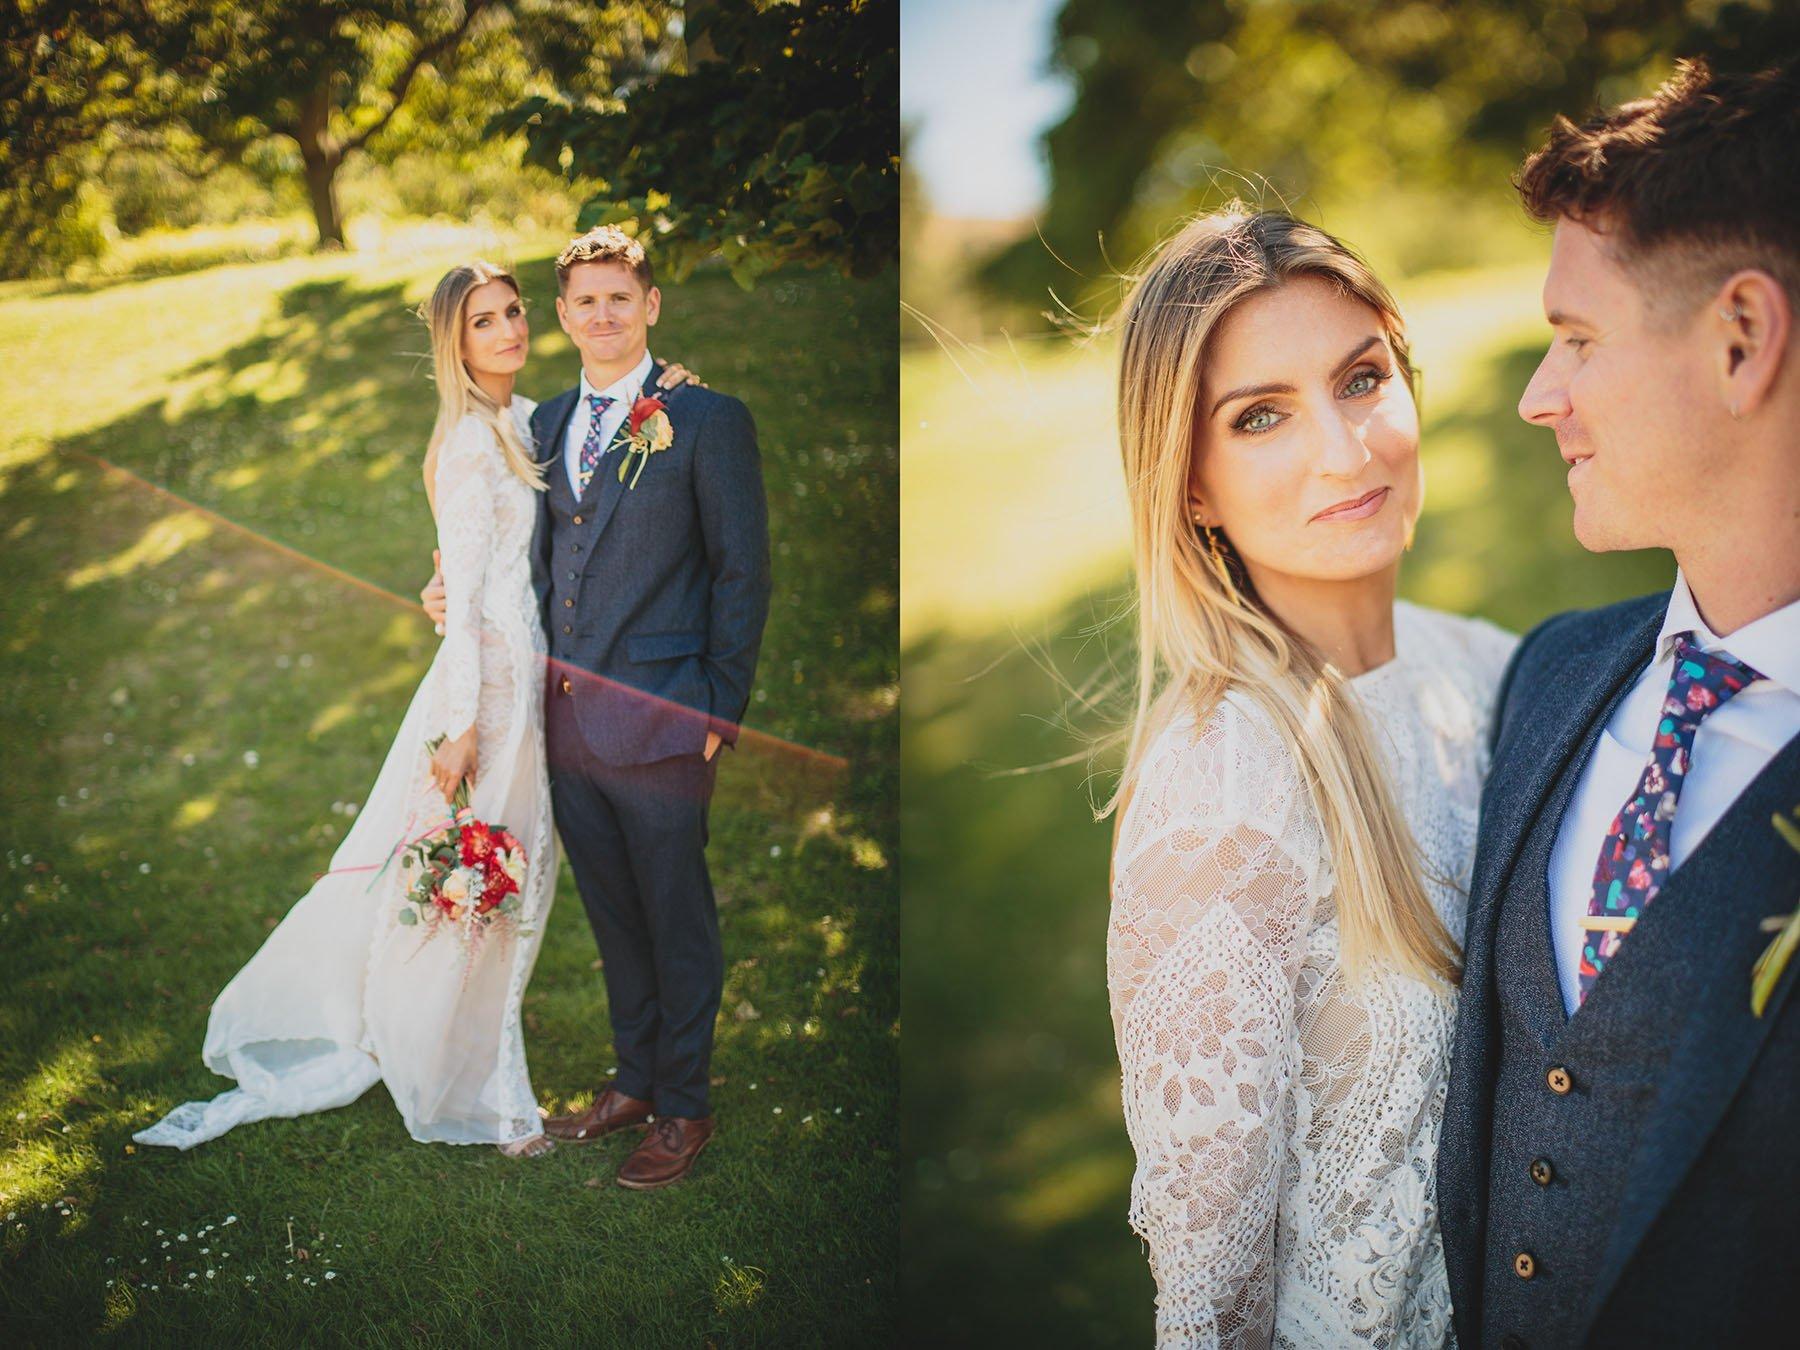 eastbourne-wedding-photography-hannah-tom-053